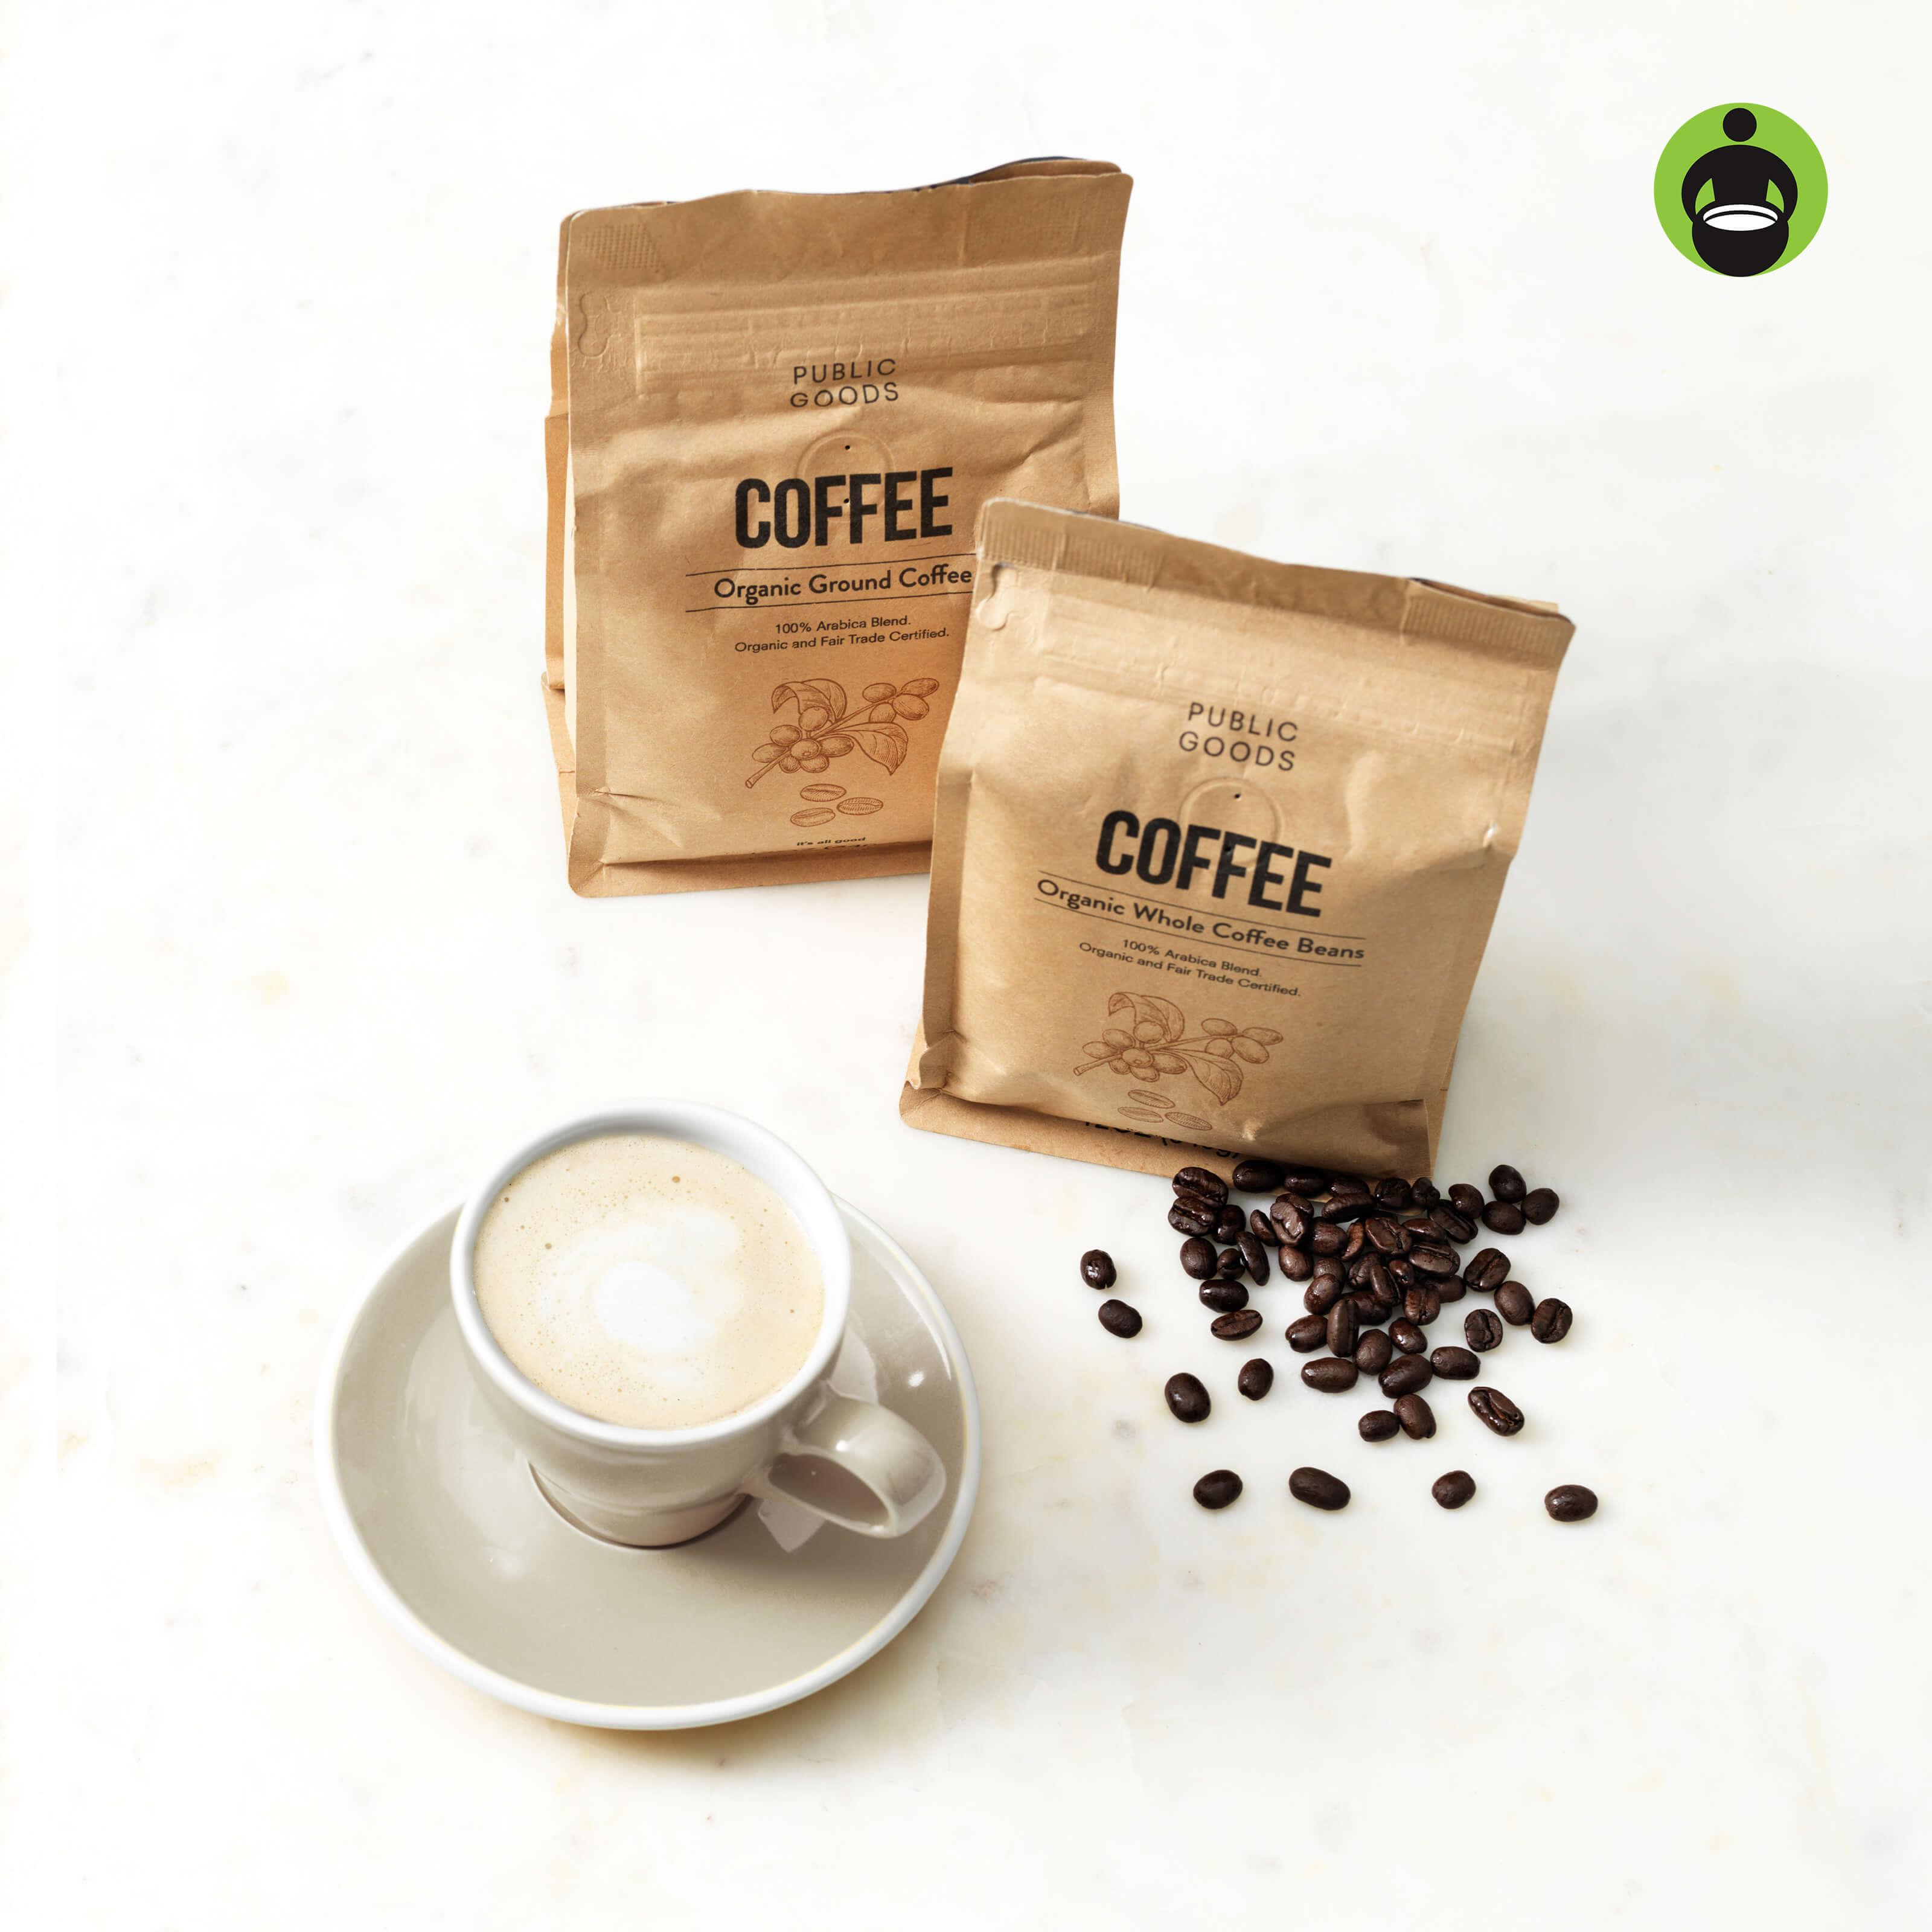 public goods coffee bags, beans, cup, saucer, fair trade usa logo